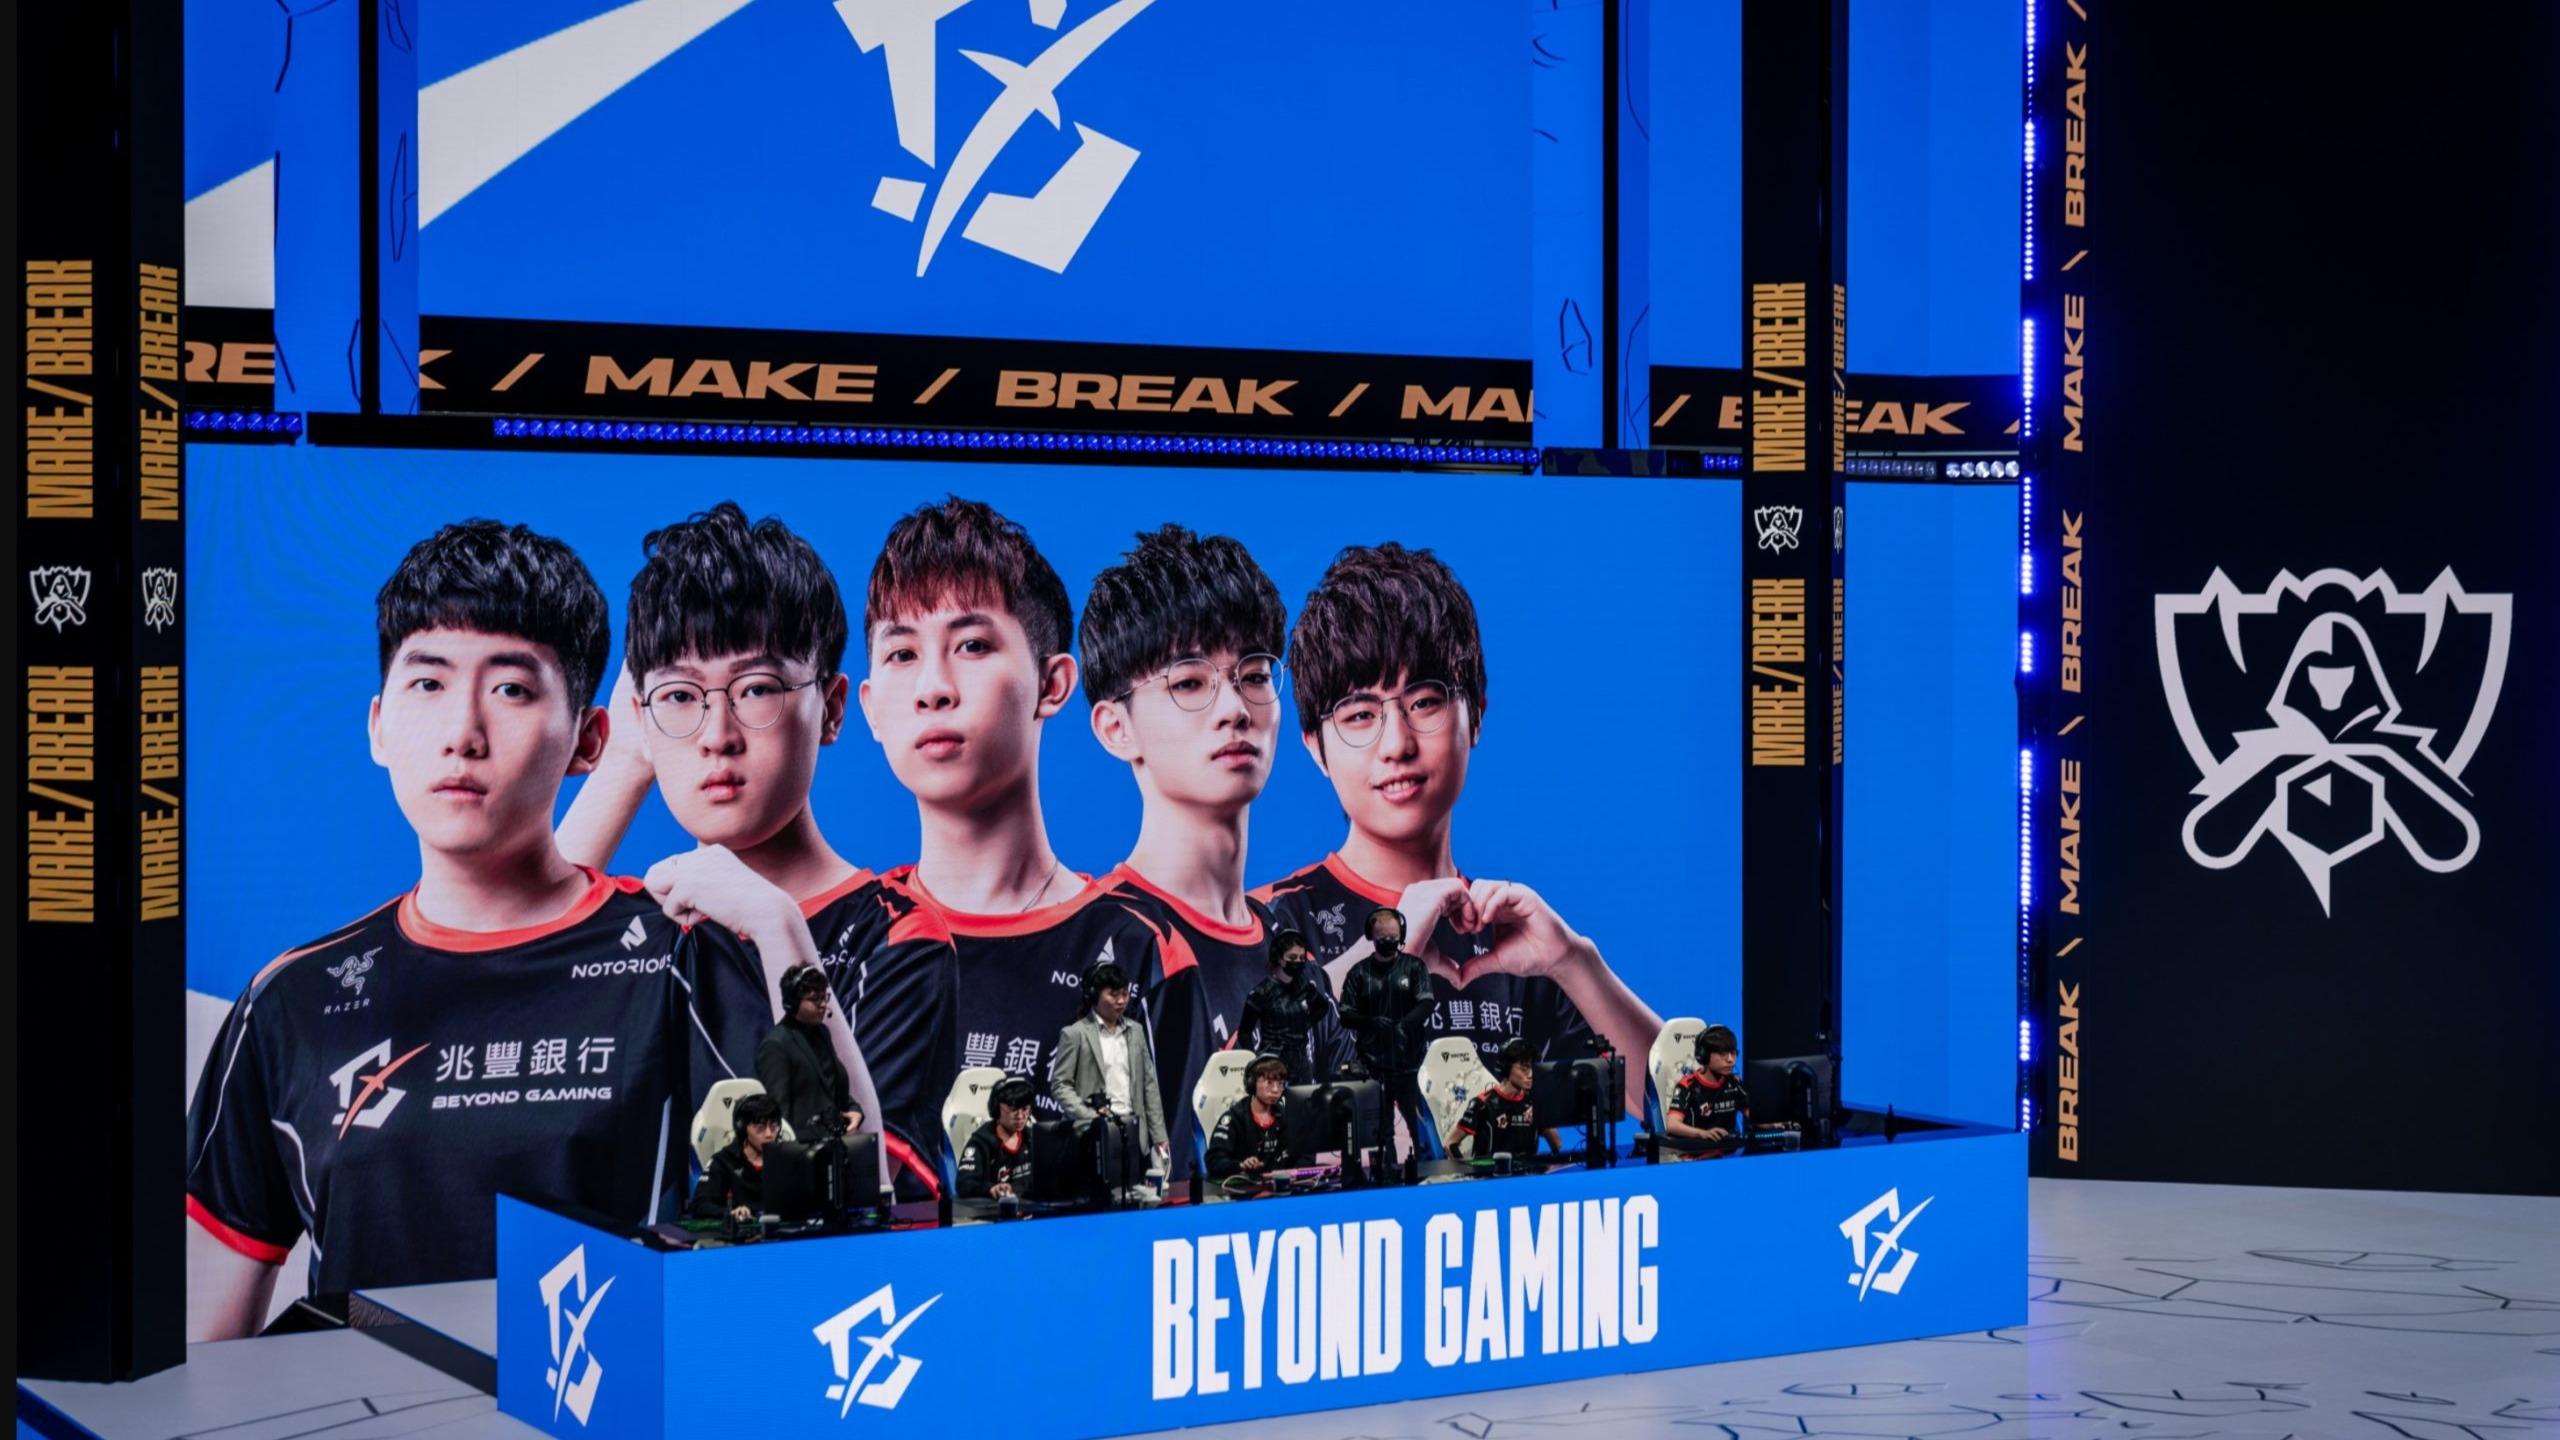 Maoan van Beyond Gaming geschorst van LoL Worlds na matchfixing